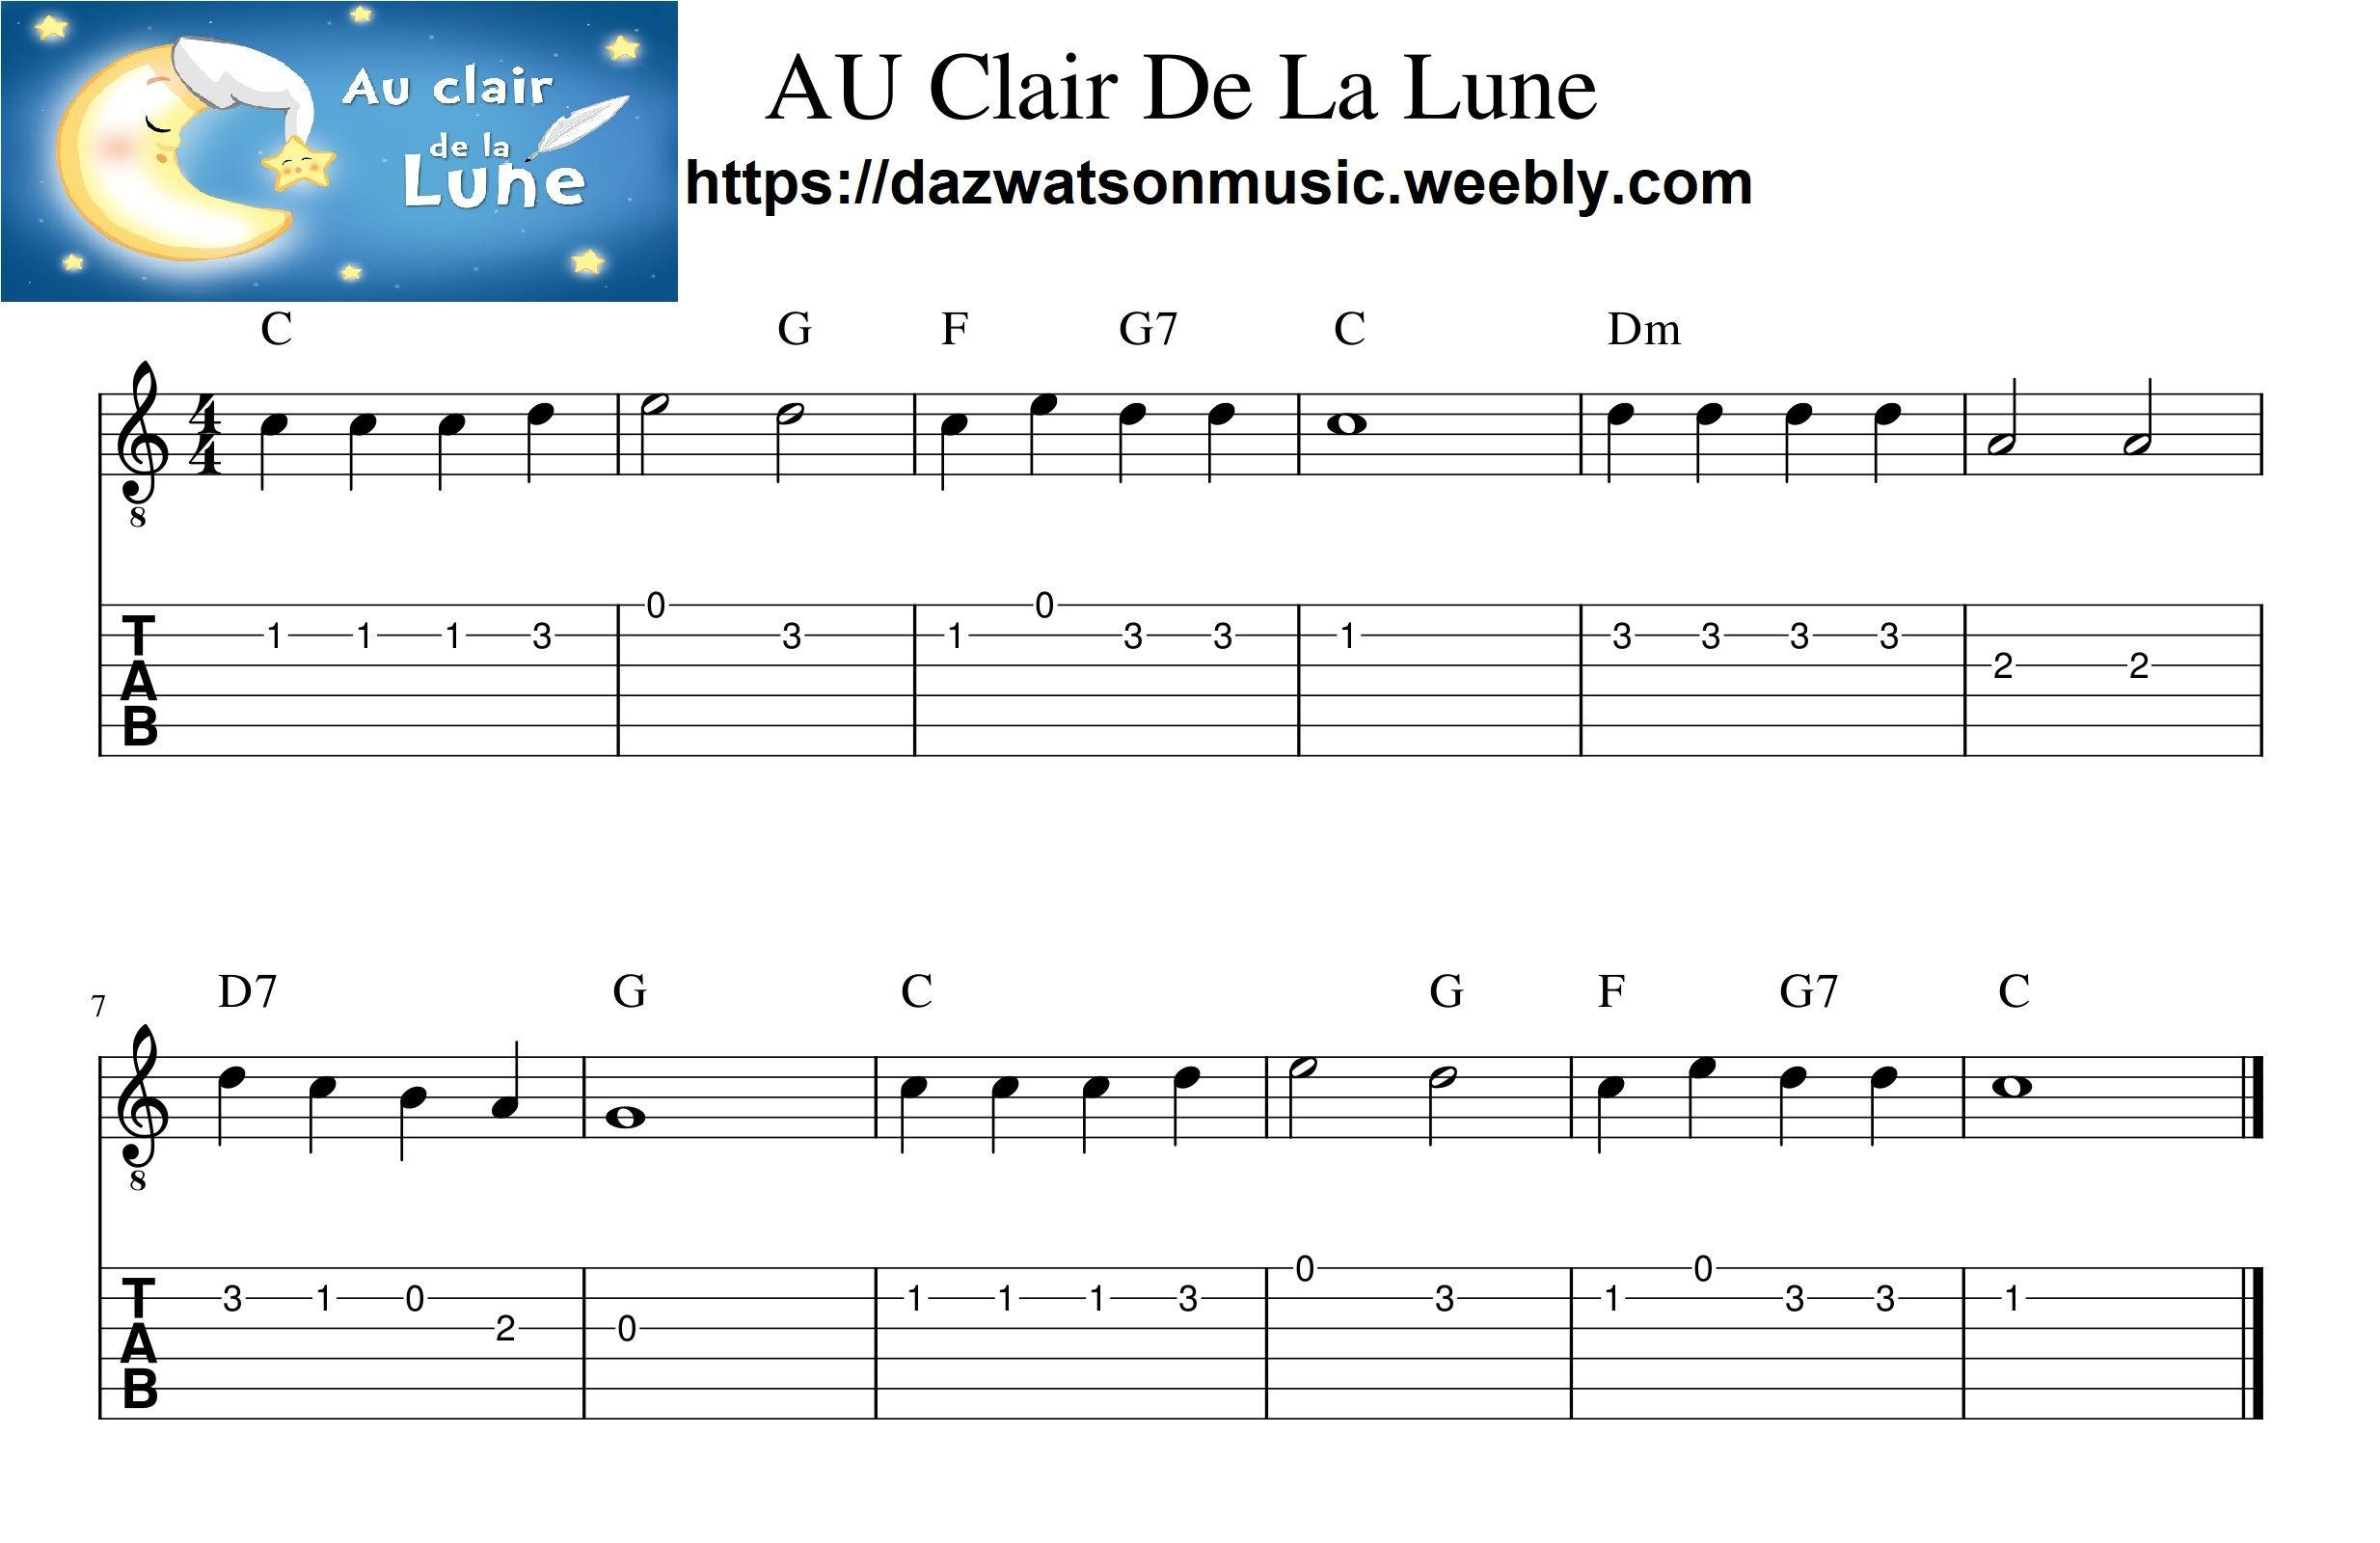 Au Clair De La Lune Easy Guitar Tab (With Images) | Easy concernant Clair De La Lune Lyrics